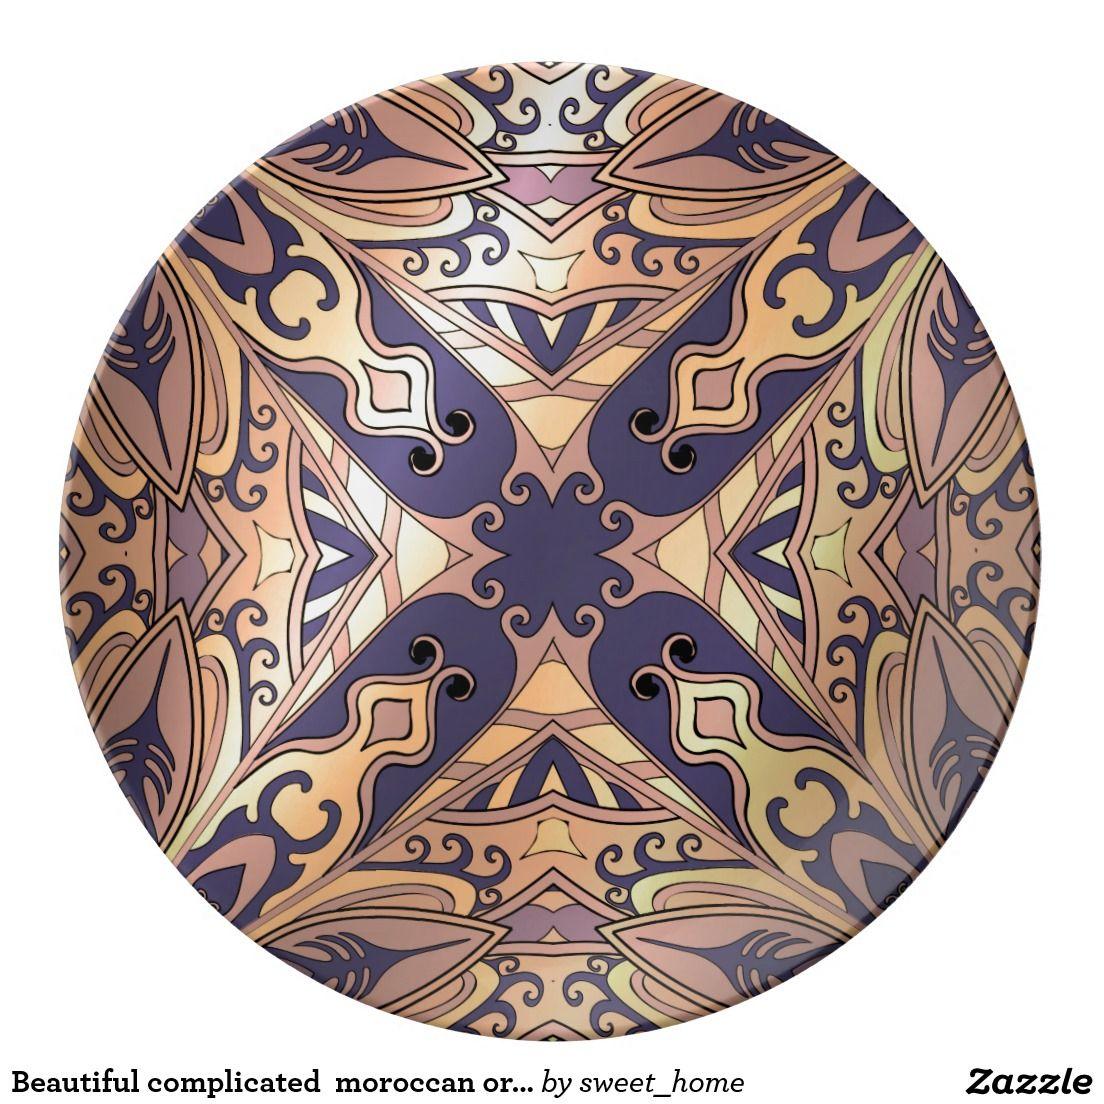 Beautiful complicated  moroccan ornament porcelain plate make interior unique and add aesthetics sense. Ornament create in oriental tradition. #Home #decor #Room #Interior #decorating #Idea #Styles